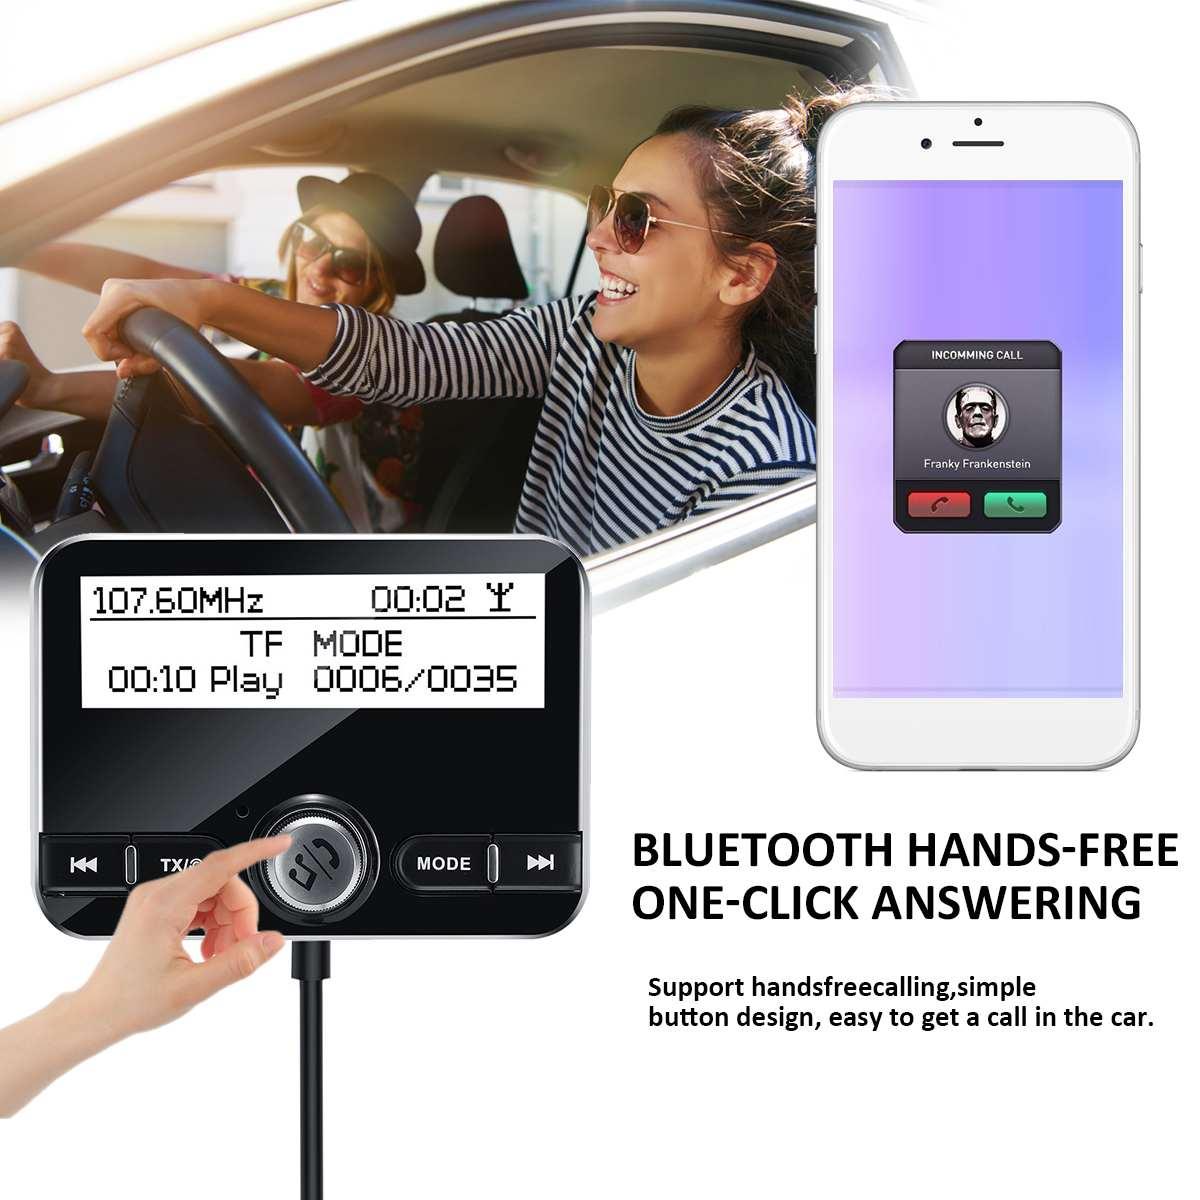 Car DAB Radio Digital Radio Receiver Tuner USB Adapter TF/AUX Antenna LCD Display Handsfree Calling bluetooth FM Transmitter